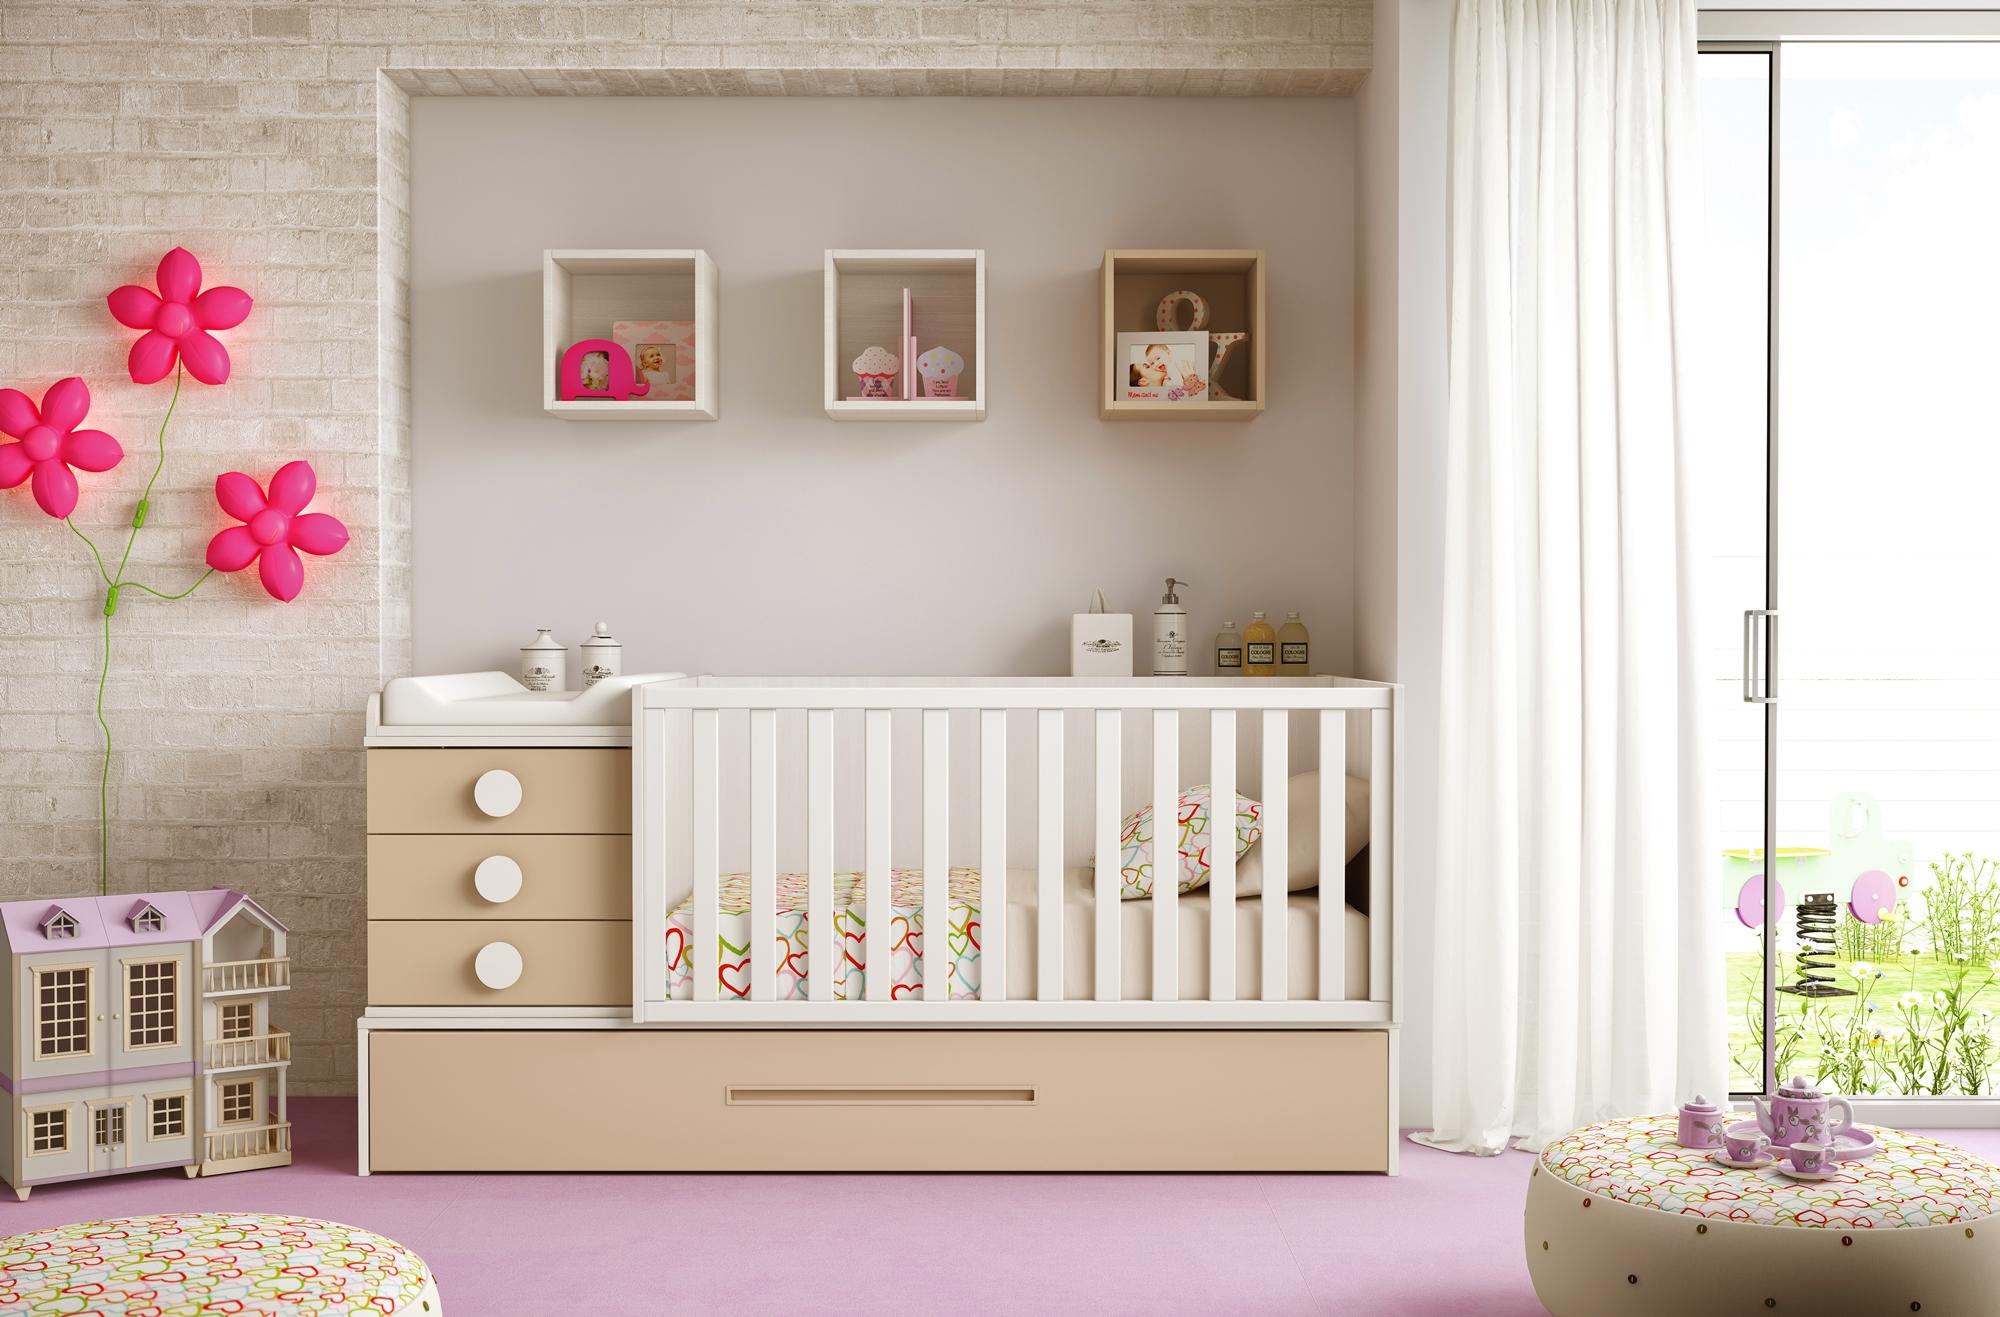 Lit pour b b lc19 pour la chambre b b volutive for Chambre pour bebe